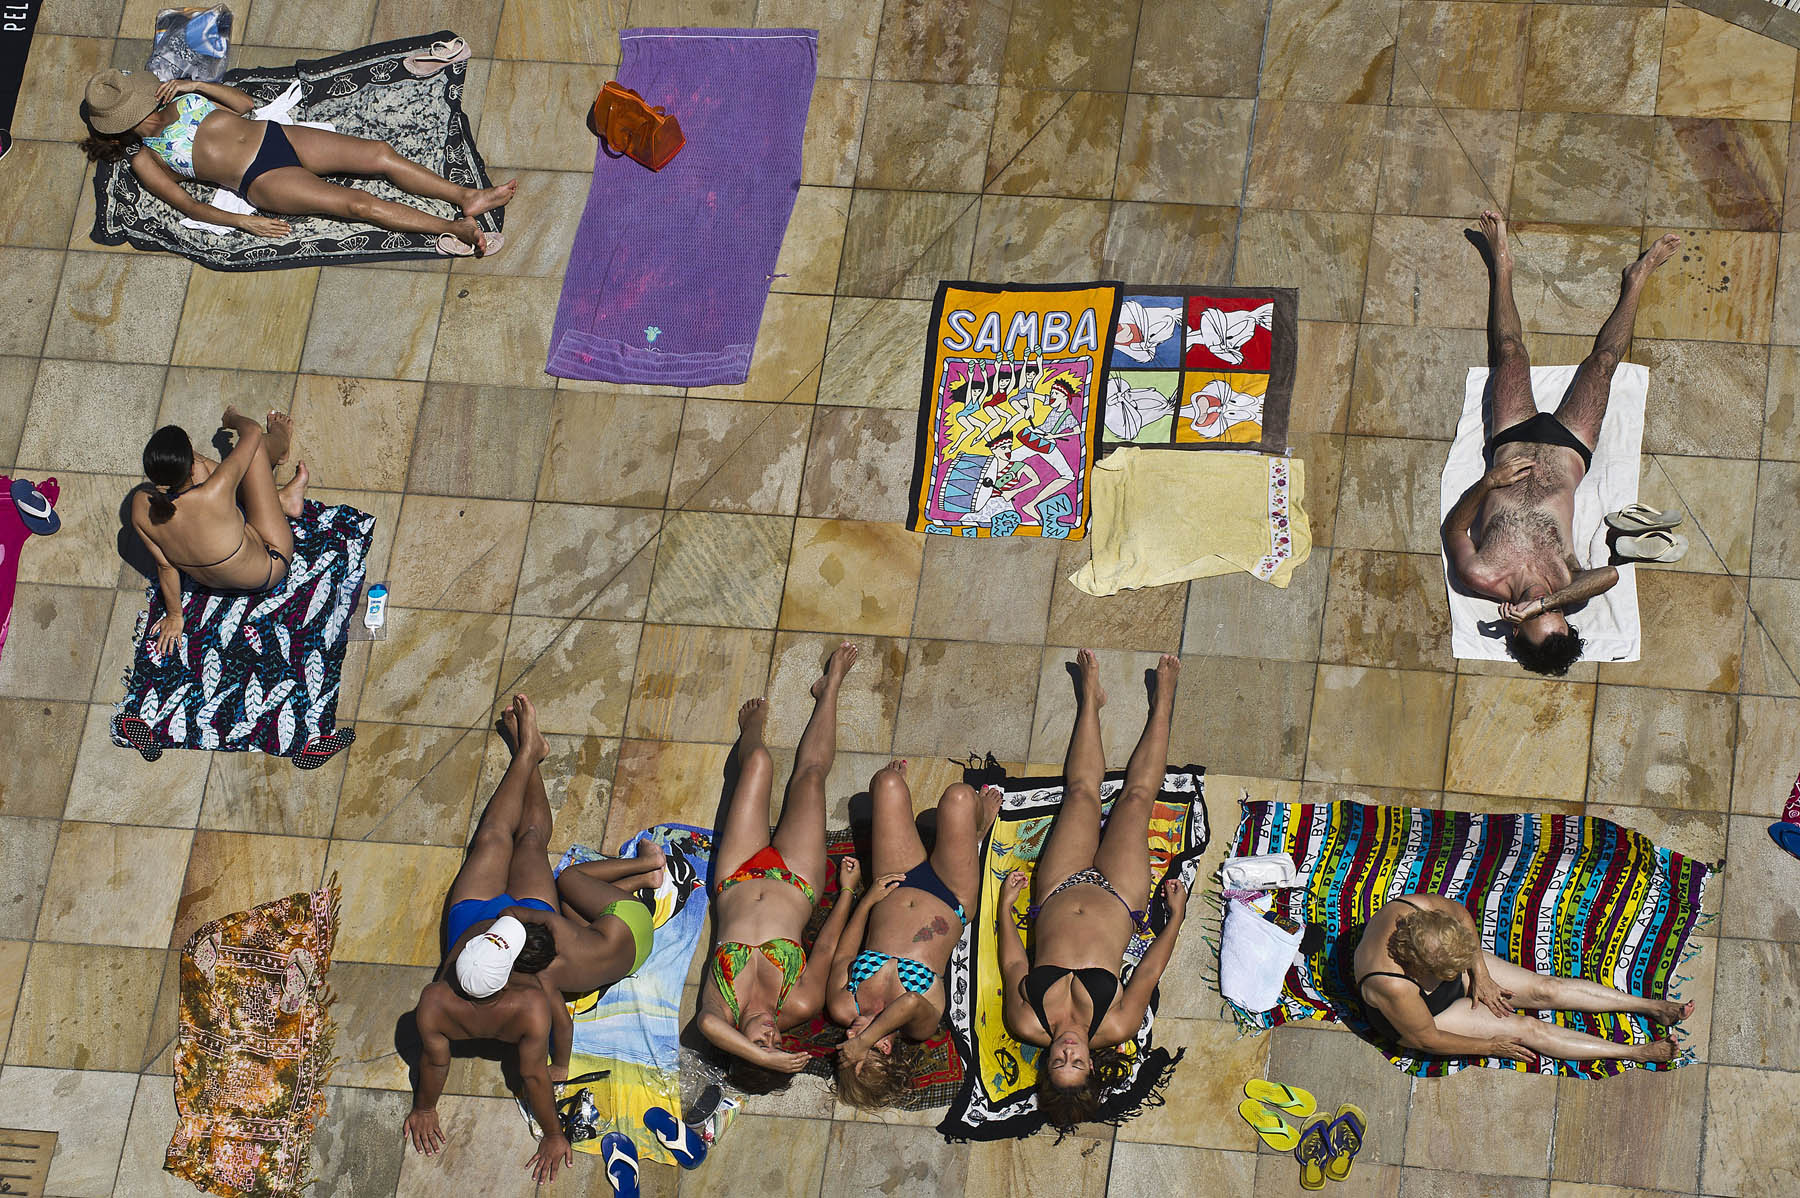 People lounge poolside at the SESC Belenzinho club in Sao Paulo, Brazil on Jan. 31, 2014.